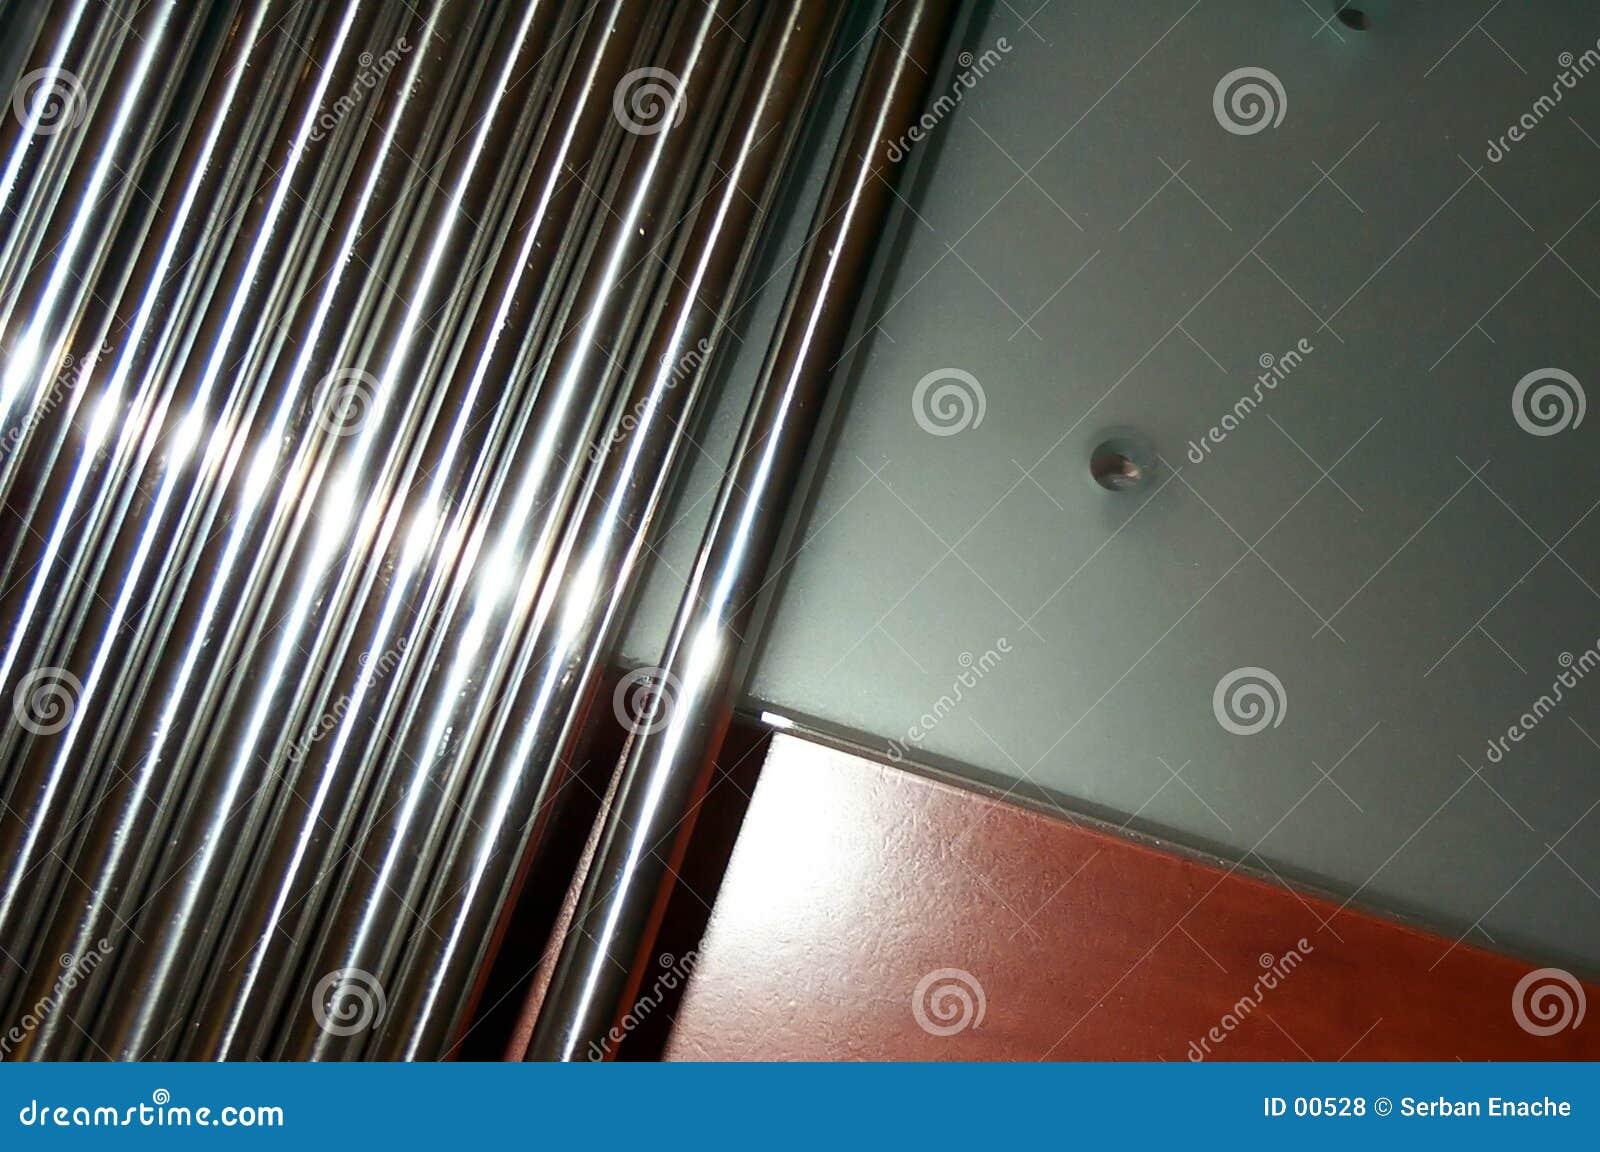 Steel bars concept